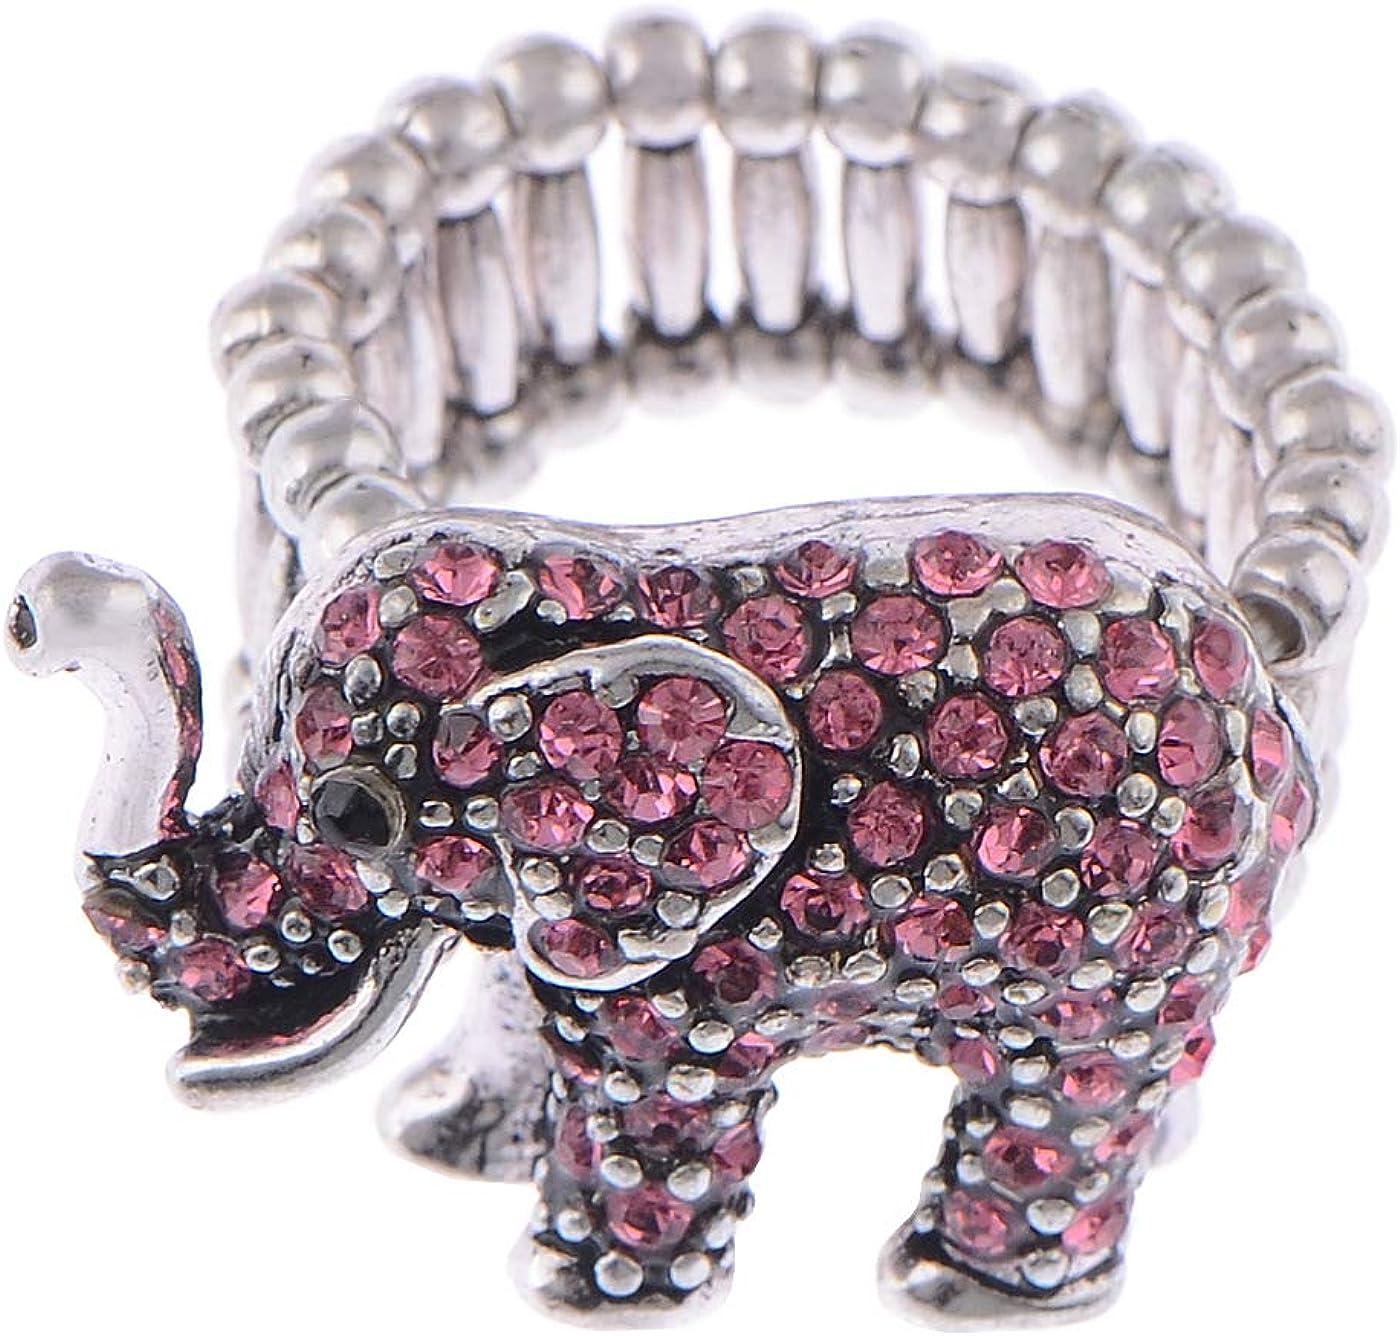 Alilang Tiny Cute Pink Rose Rhinestone Crystal African Safari Playful Elephant Adj Ring